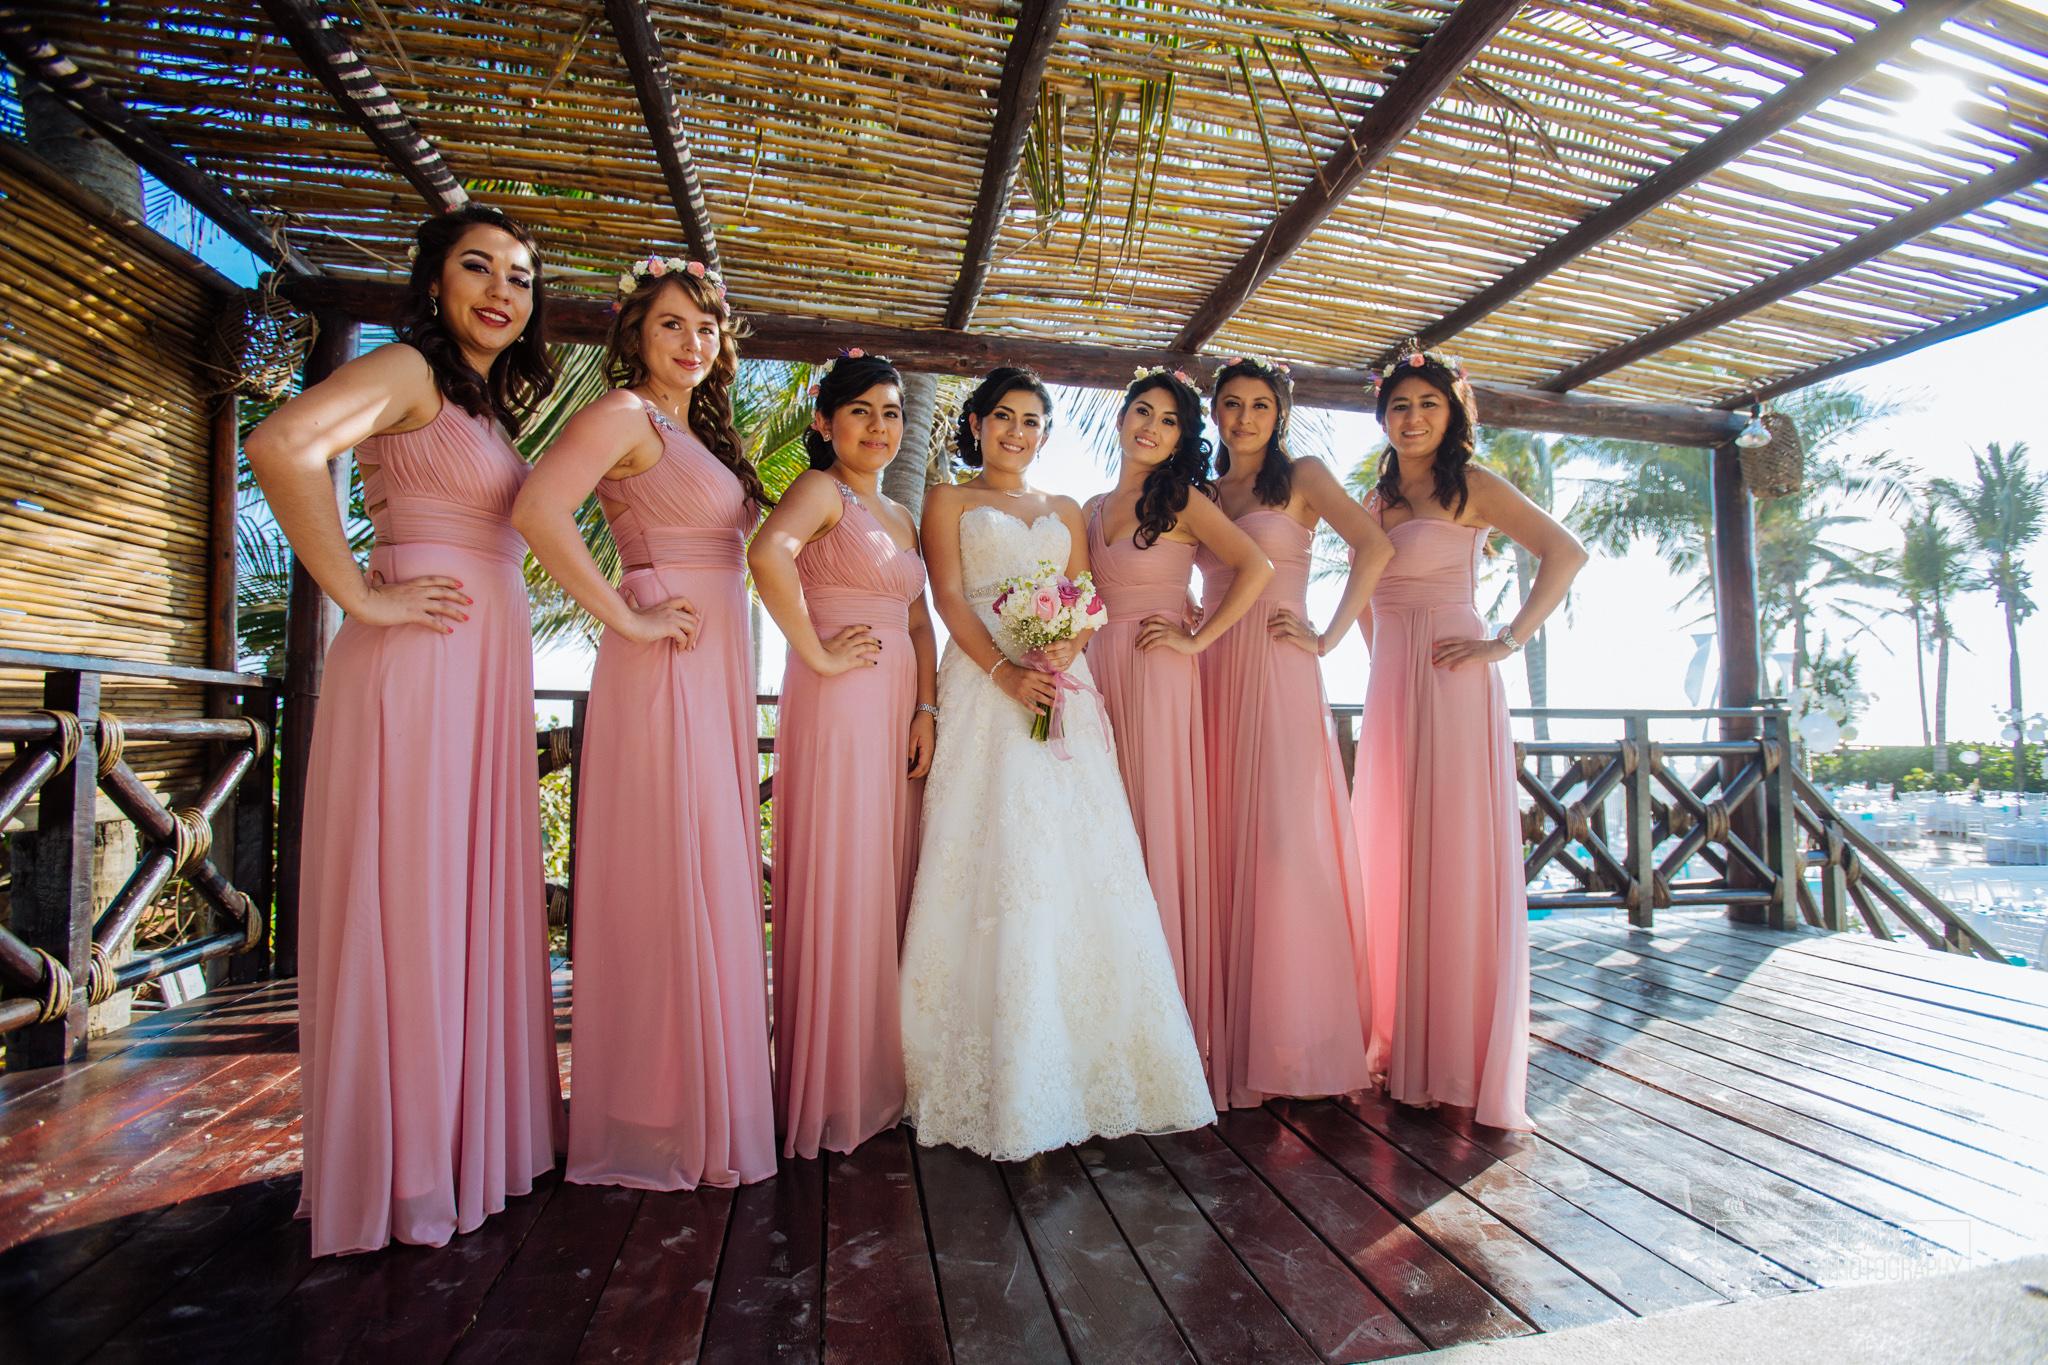 Pay and Ferran_Acapulco_Destination Wedding_Elizalde Photography-51.jpg